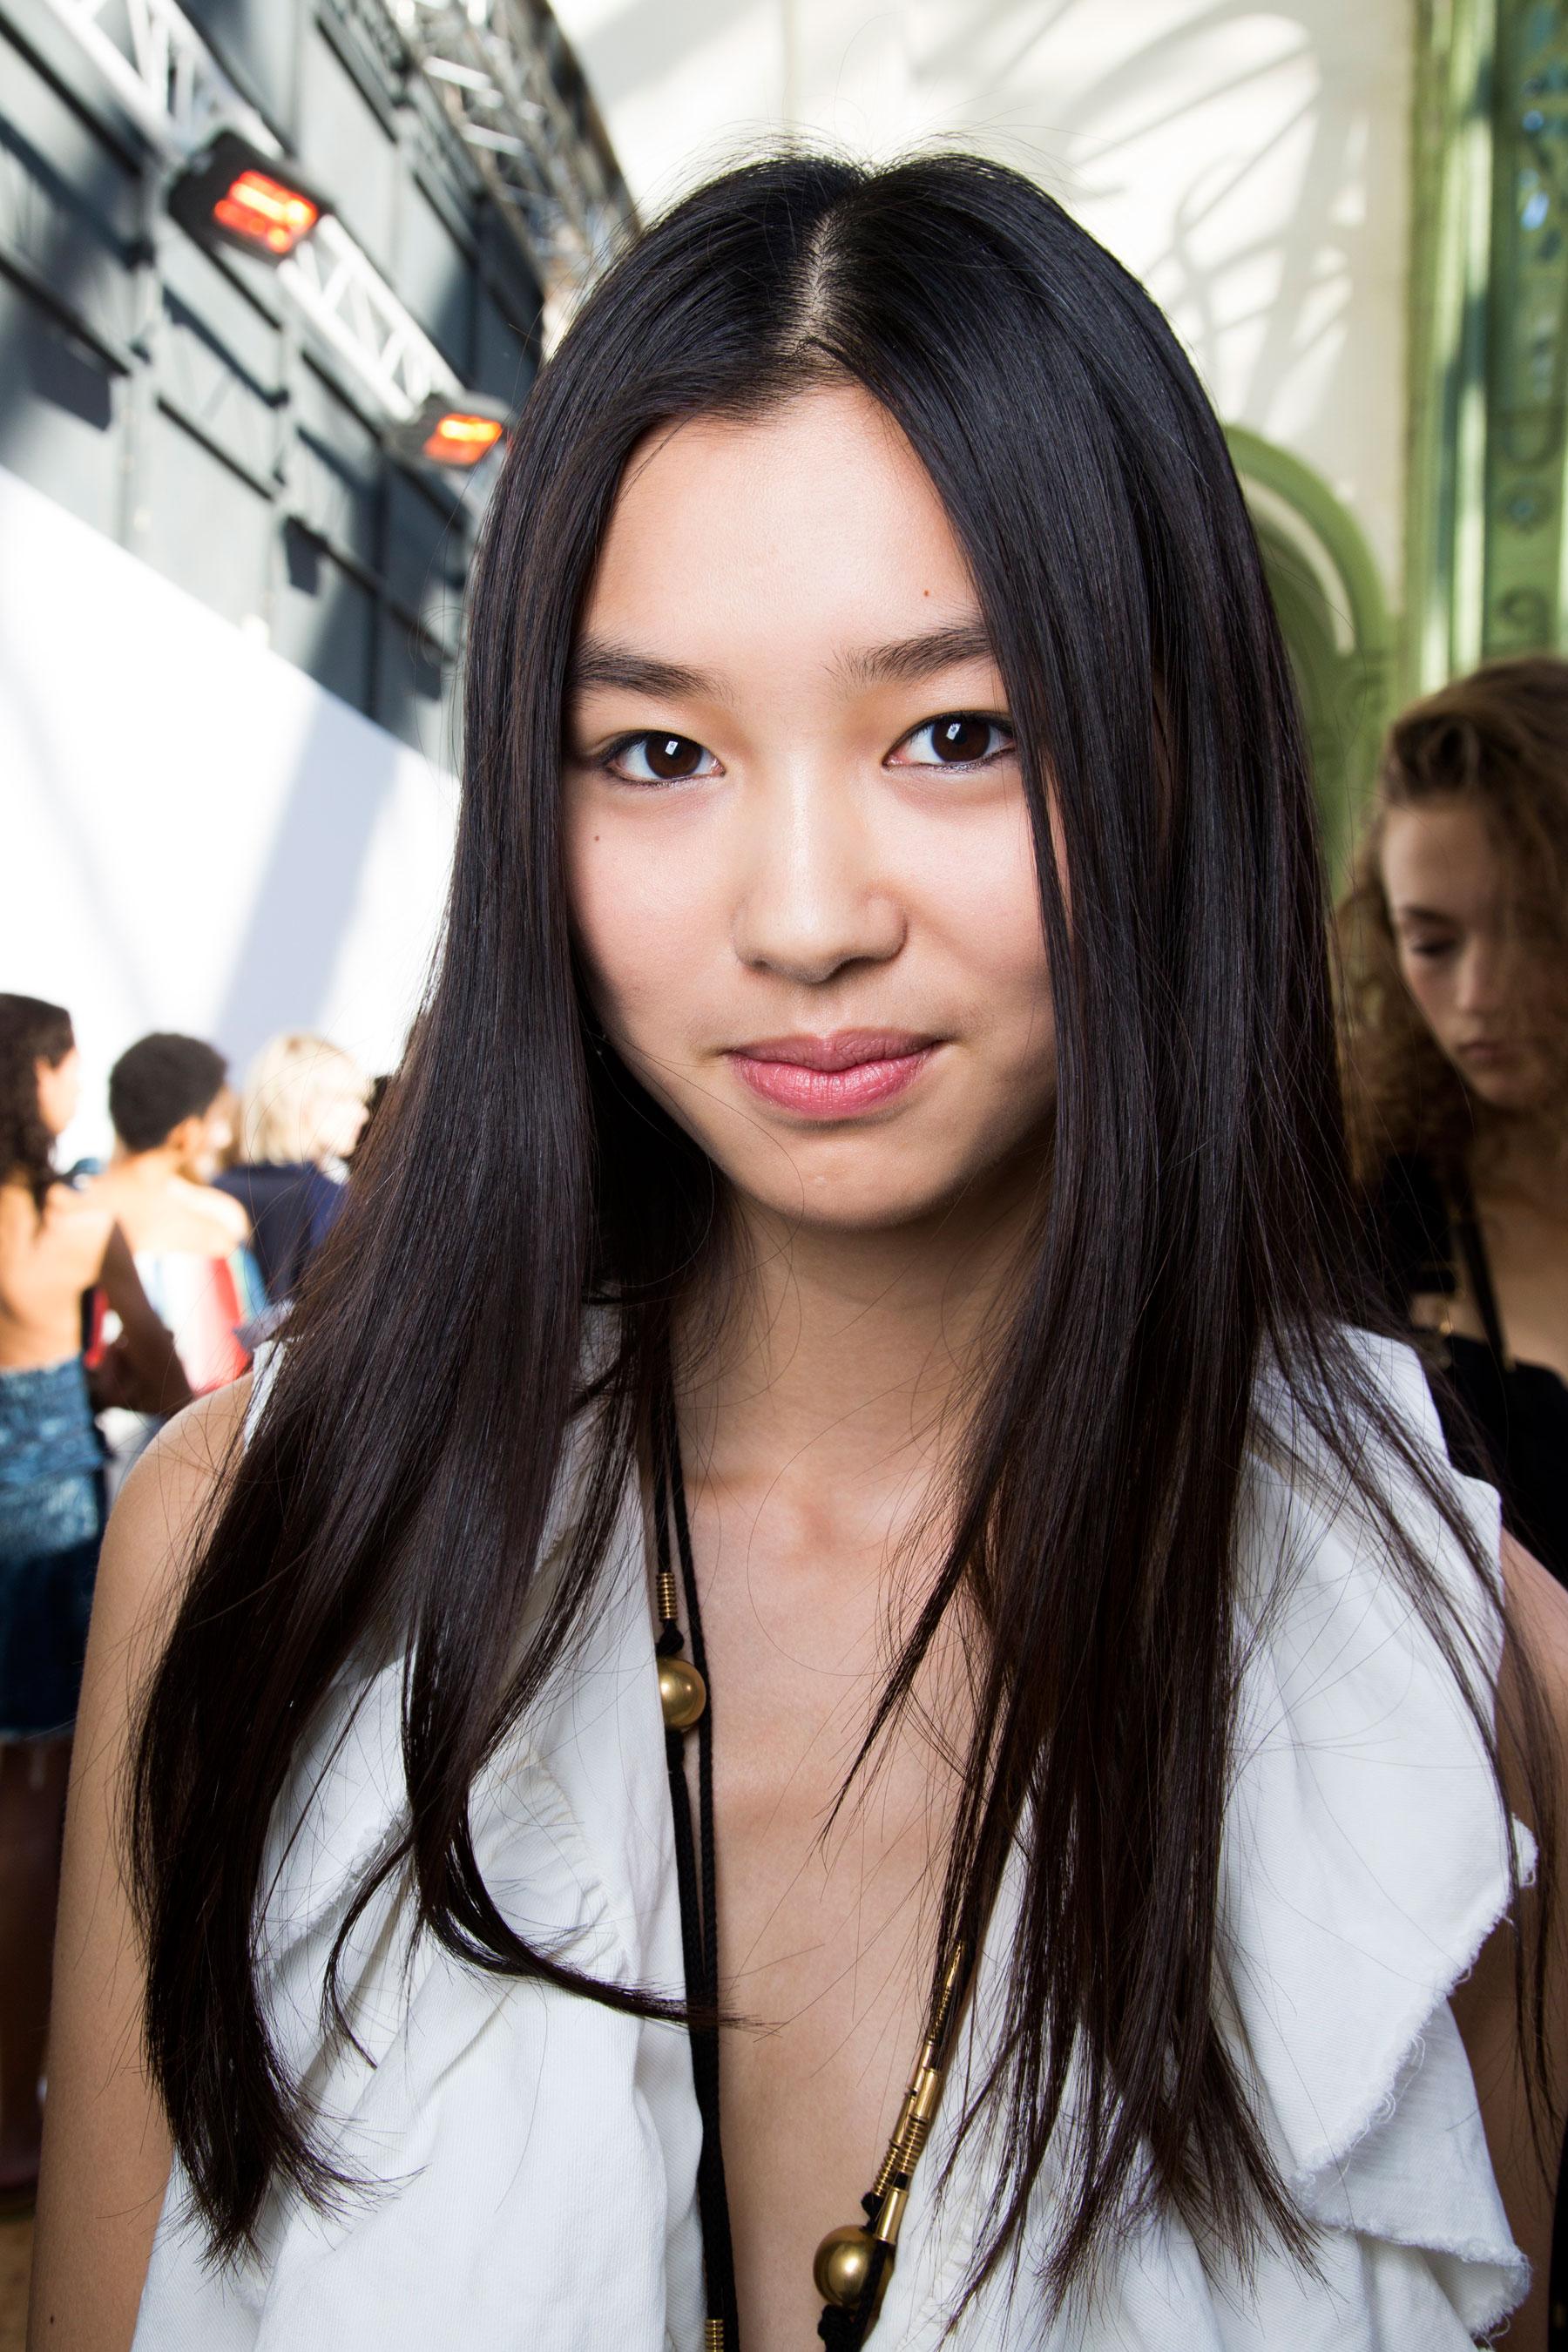 Chloe-spring-2016-beauty-fashion-show-the-impression-124